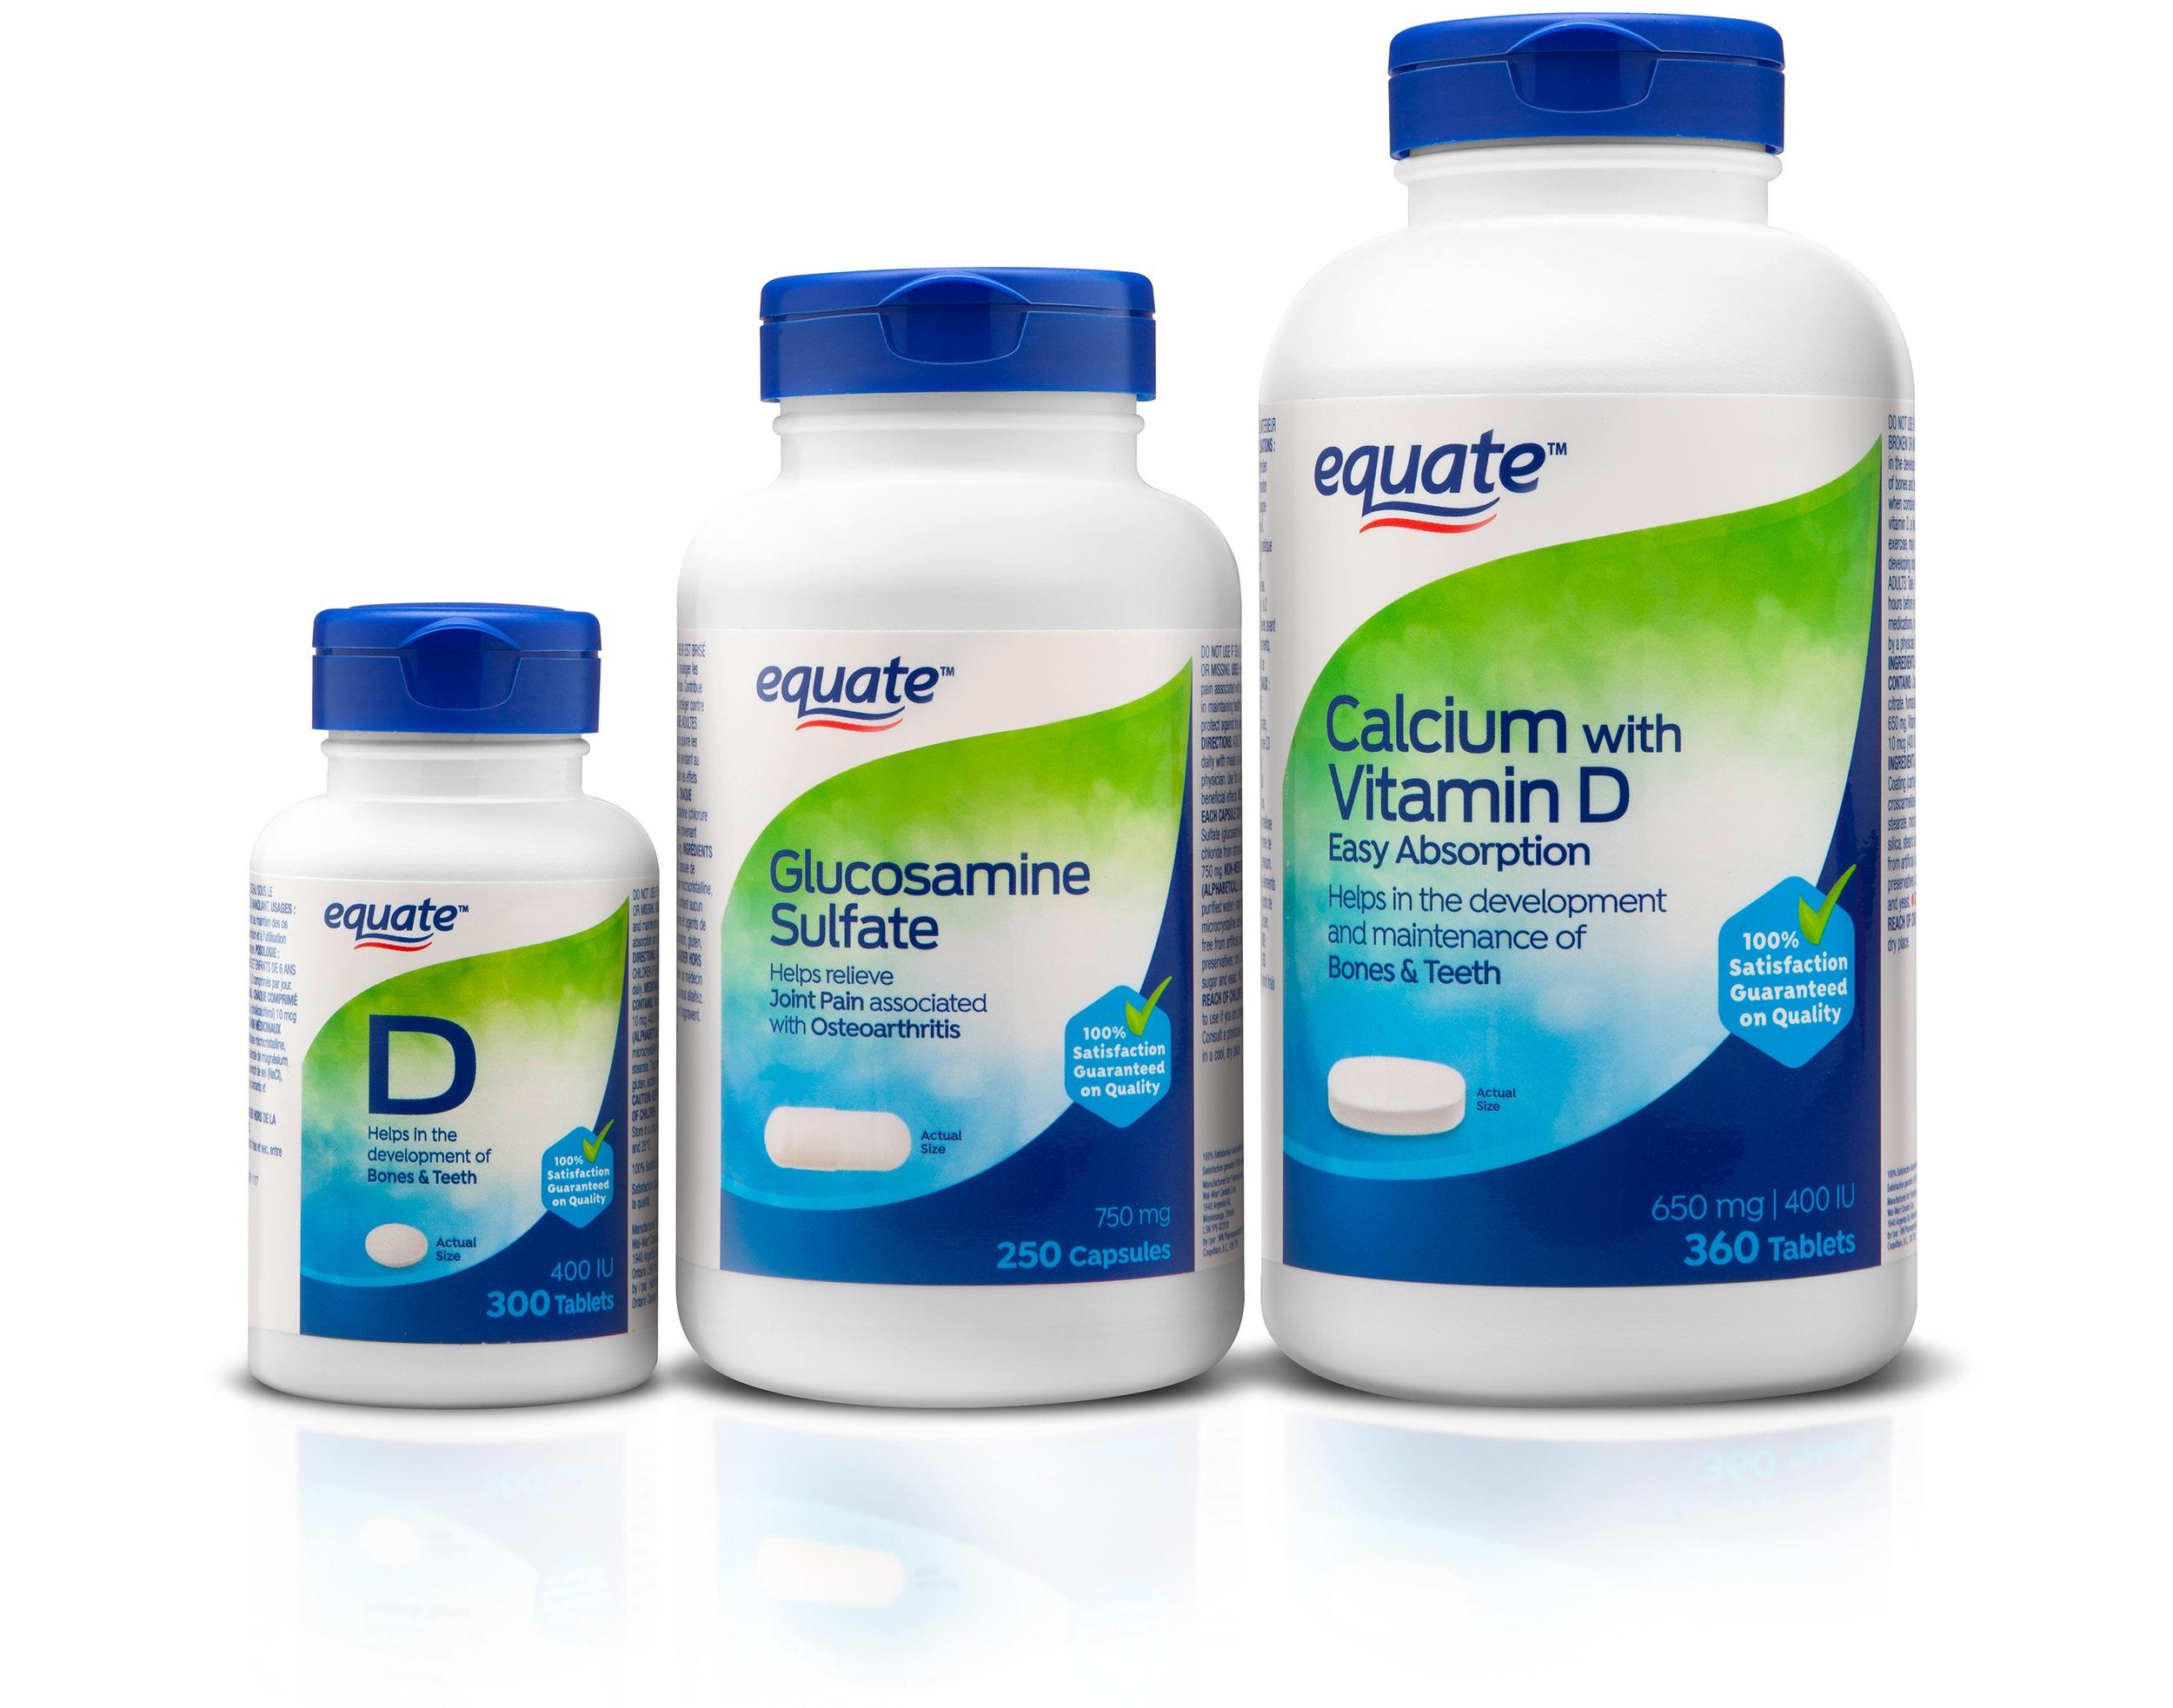 Bridgemark-Design-Agency-Equate-Vitamins-Walmart-Brand-Design-GDUSA-Awards.jpg